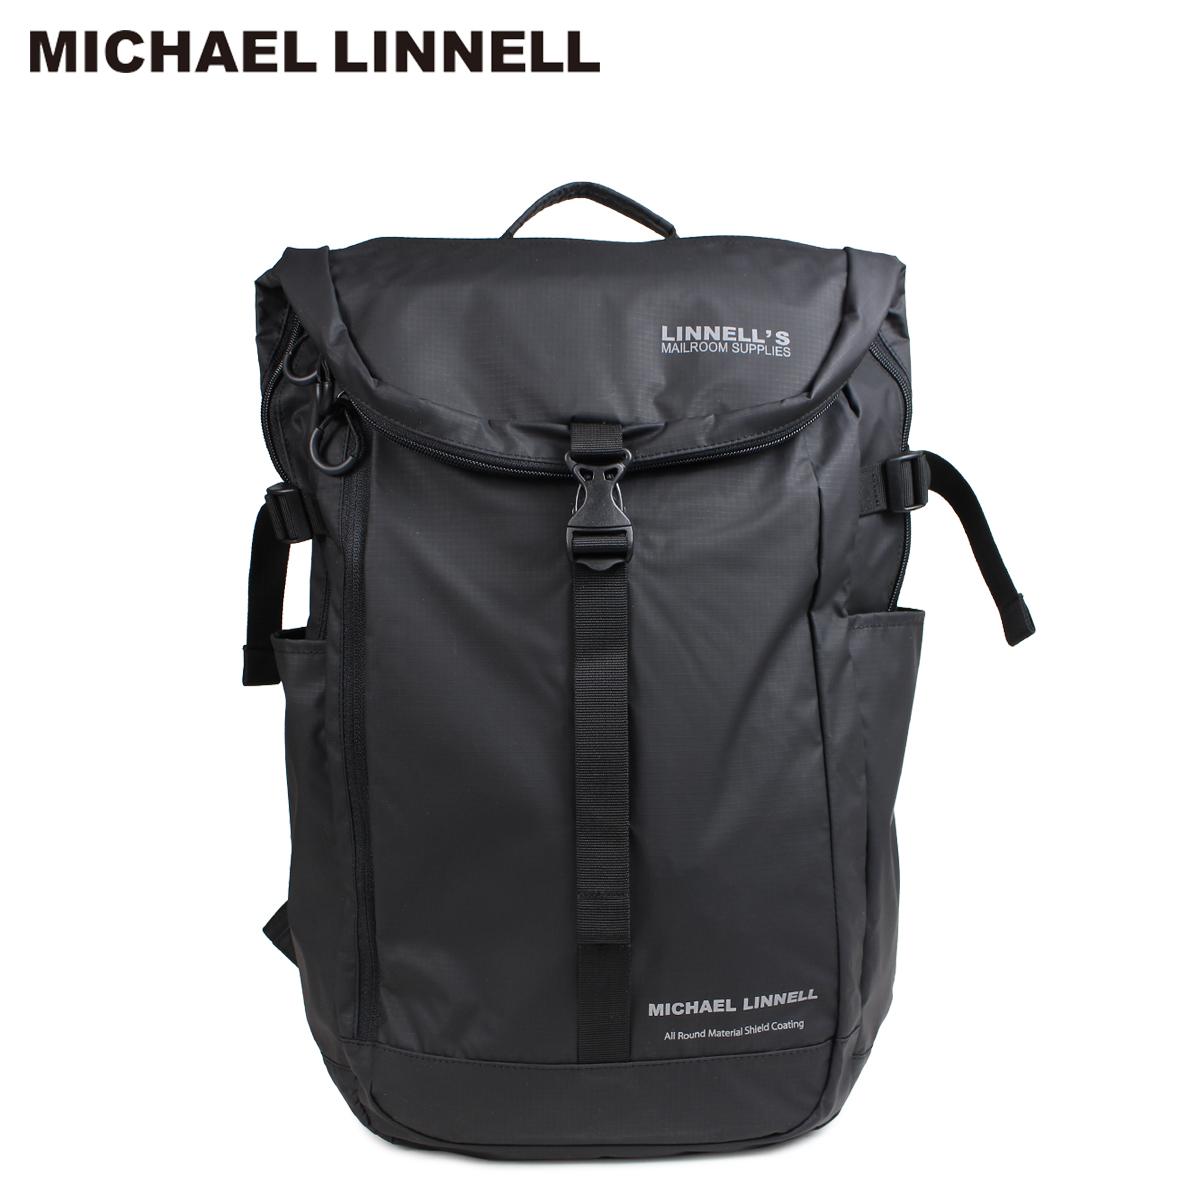 MICHAEL LINNELL マイケルリンネル リュック バッグ 31L メンズ レディース バックパック BACKPACK ブラック MLAC-04